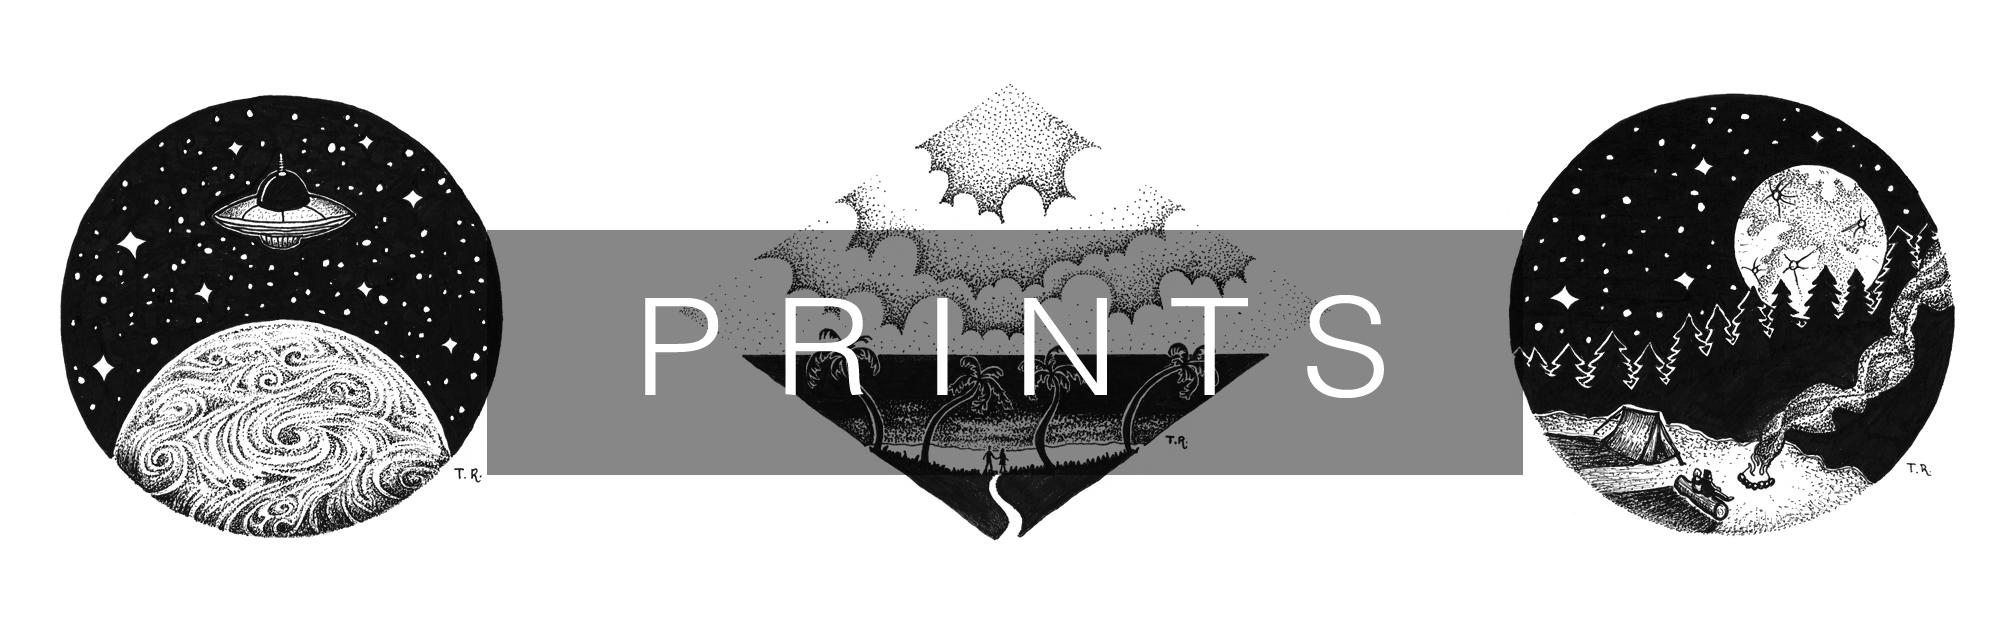 print slideshow3a.png